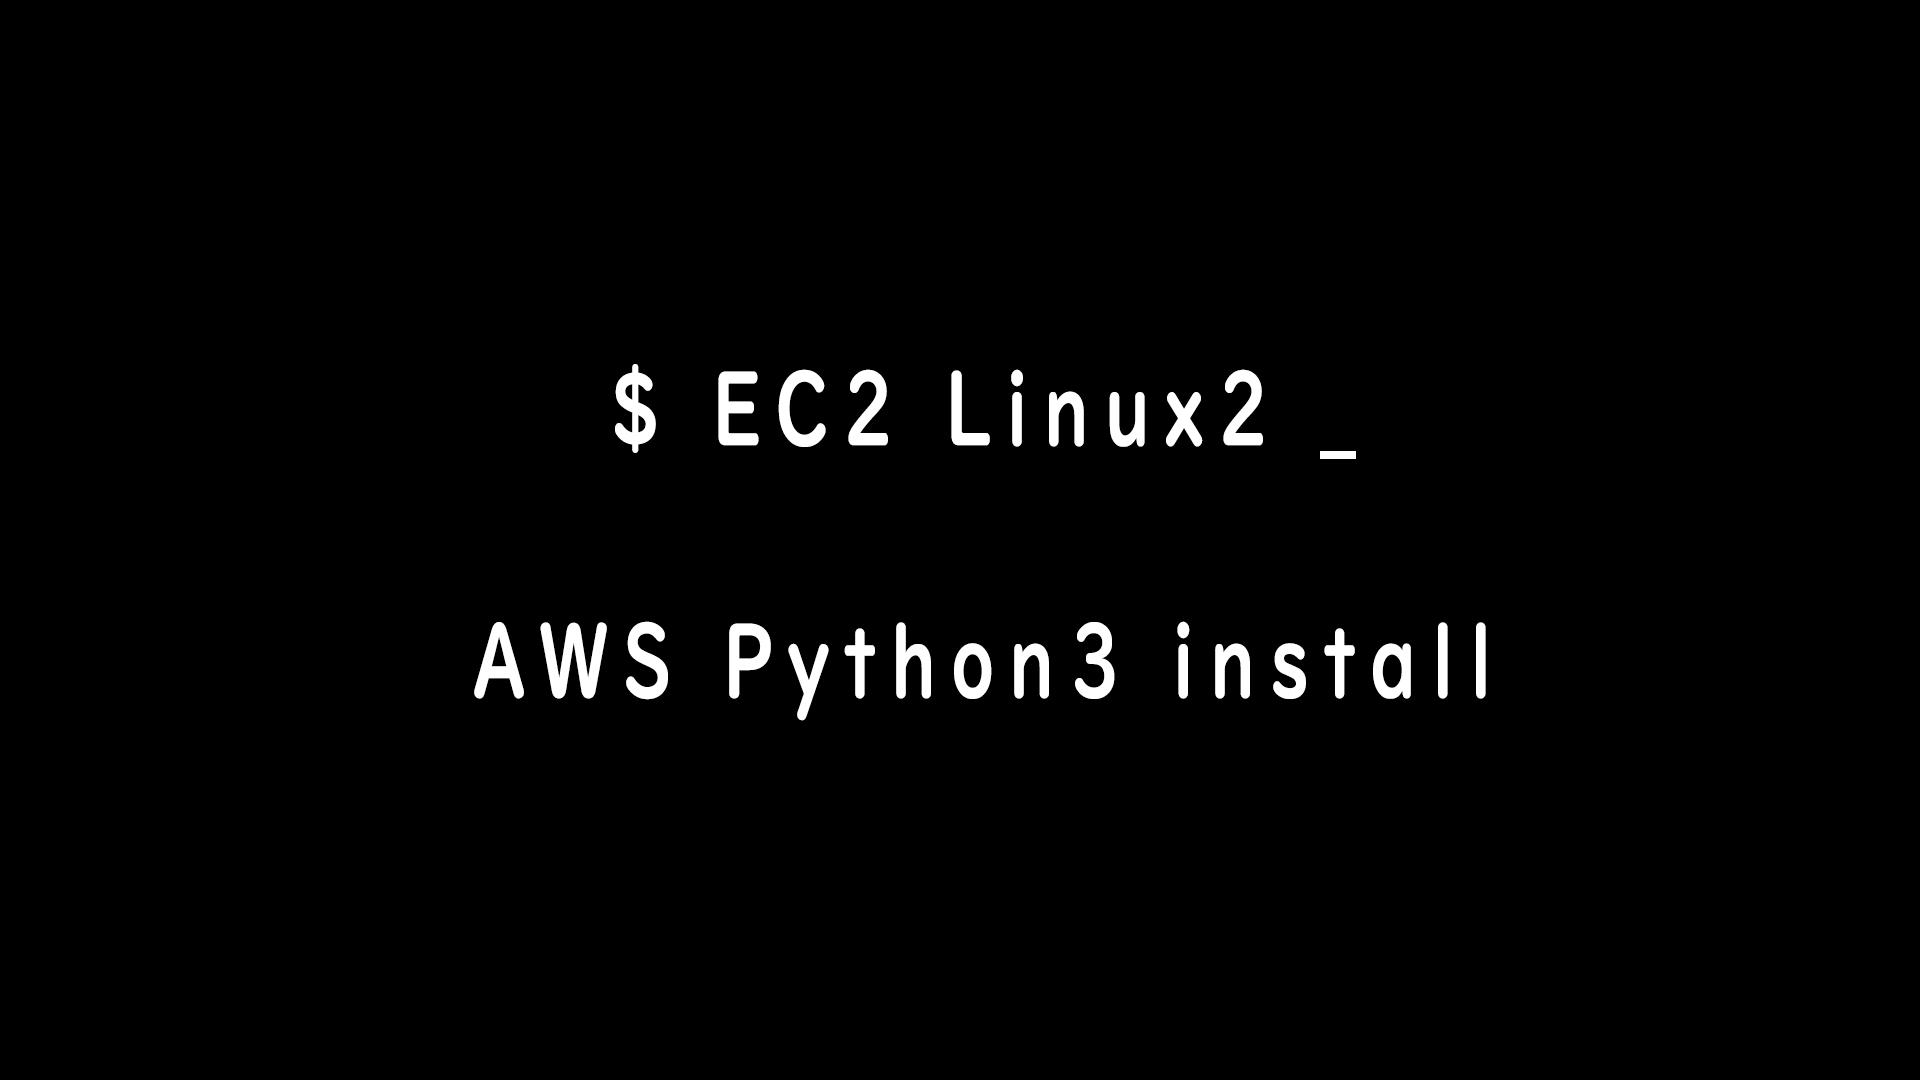 AWSのEC2Linux2を操作してPython3をインストールする方法